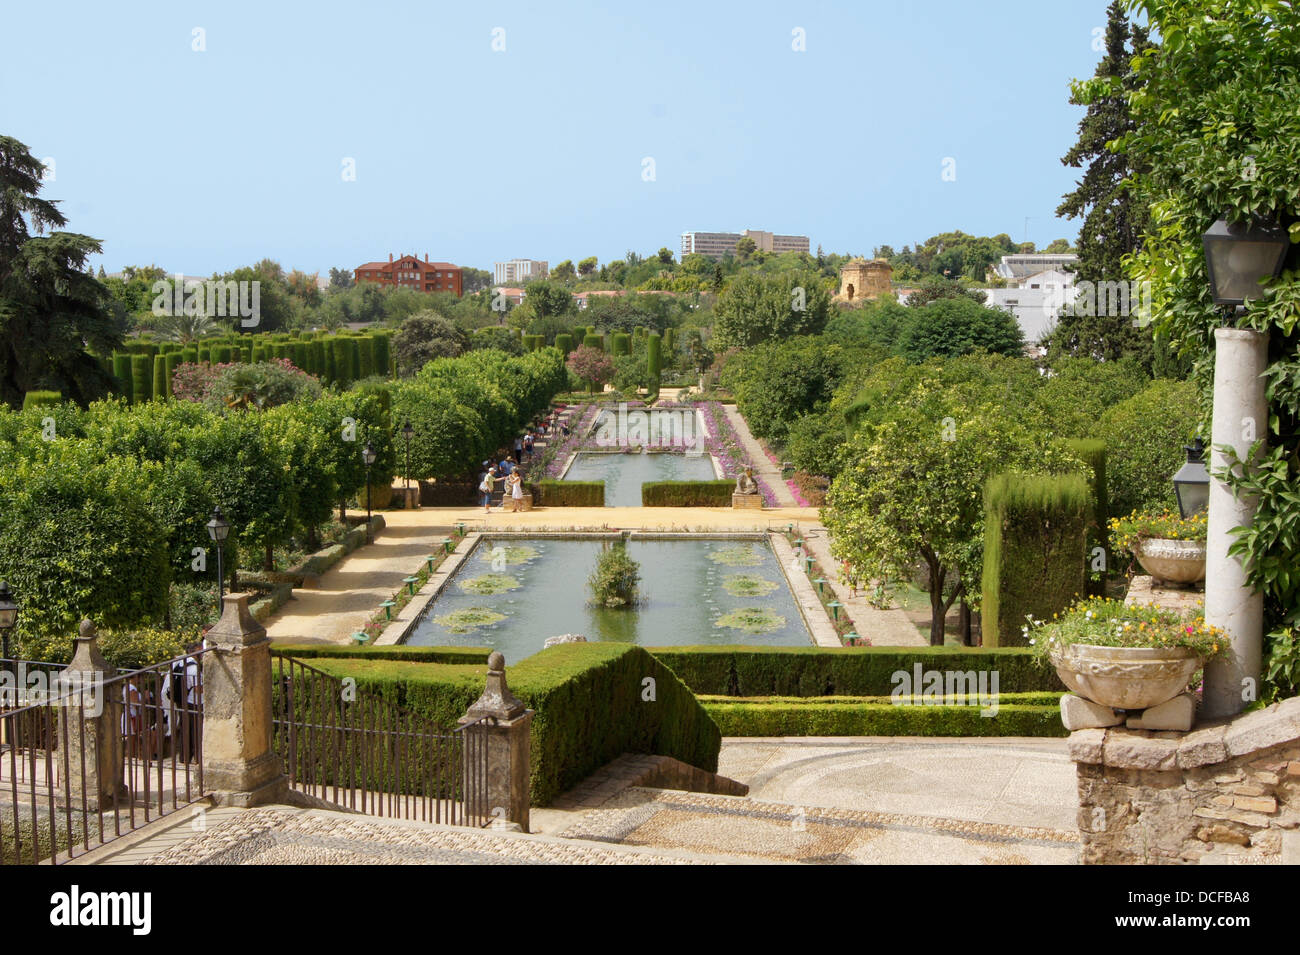 garden of the Alcazar de los Reyes Cristianos in Cordoba, Spain - Stock Image